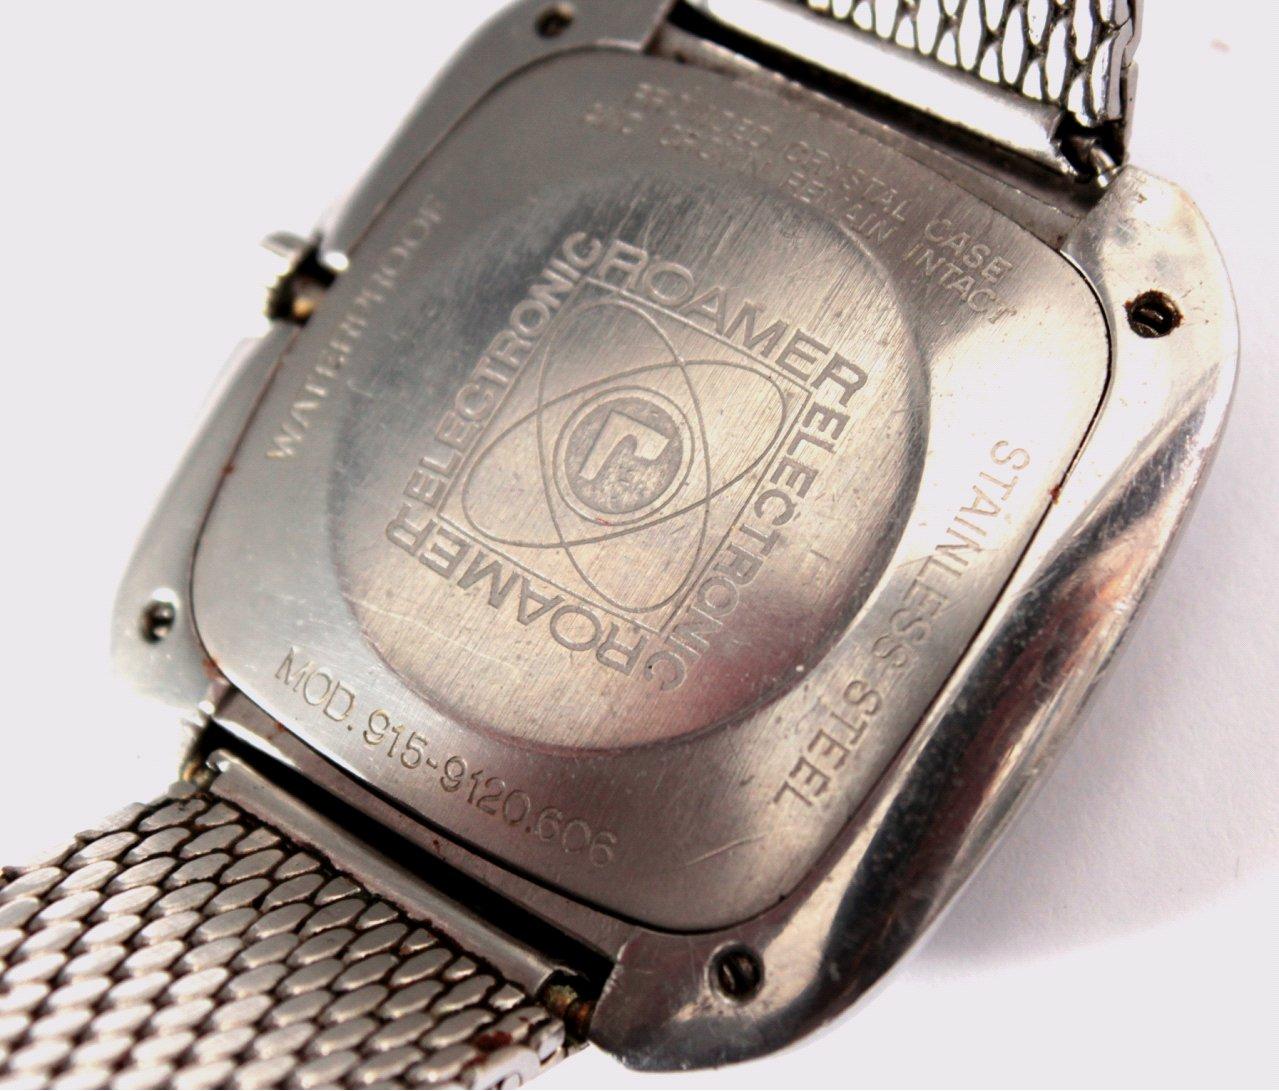 Herrenarmbanduhr der Marke Roamer aus den 80er Jahren-1